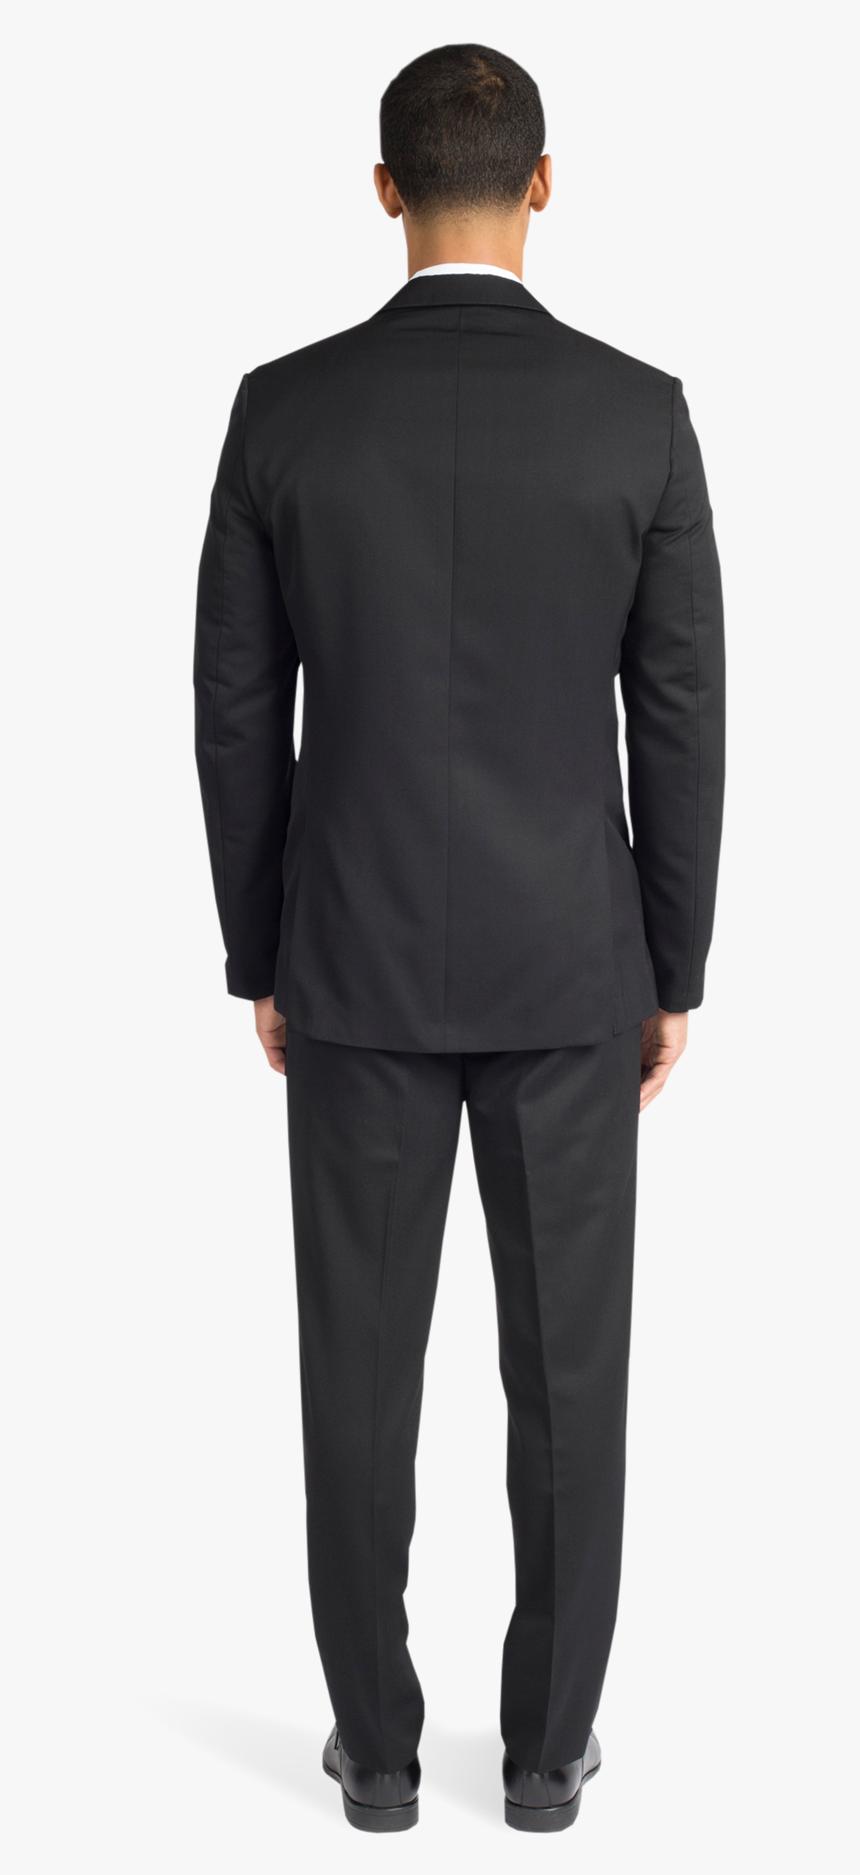 Black Michael Kors Tux, HD Png Download, Free Download